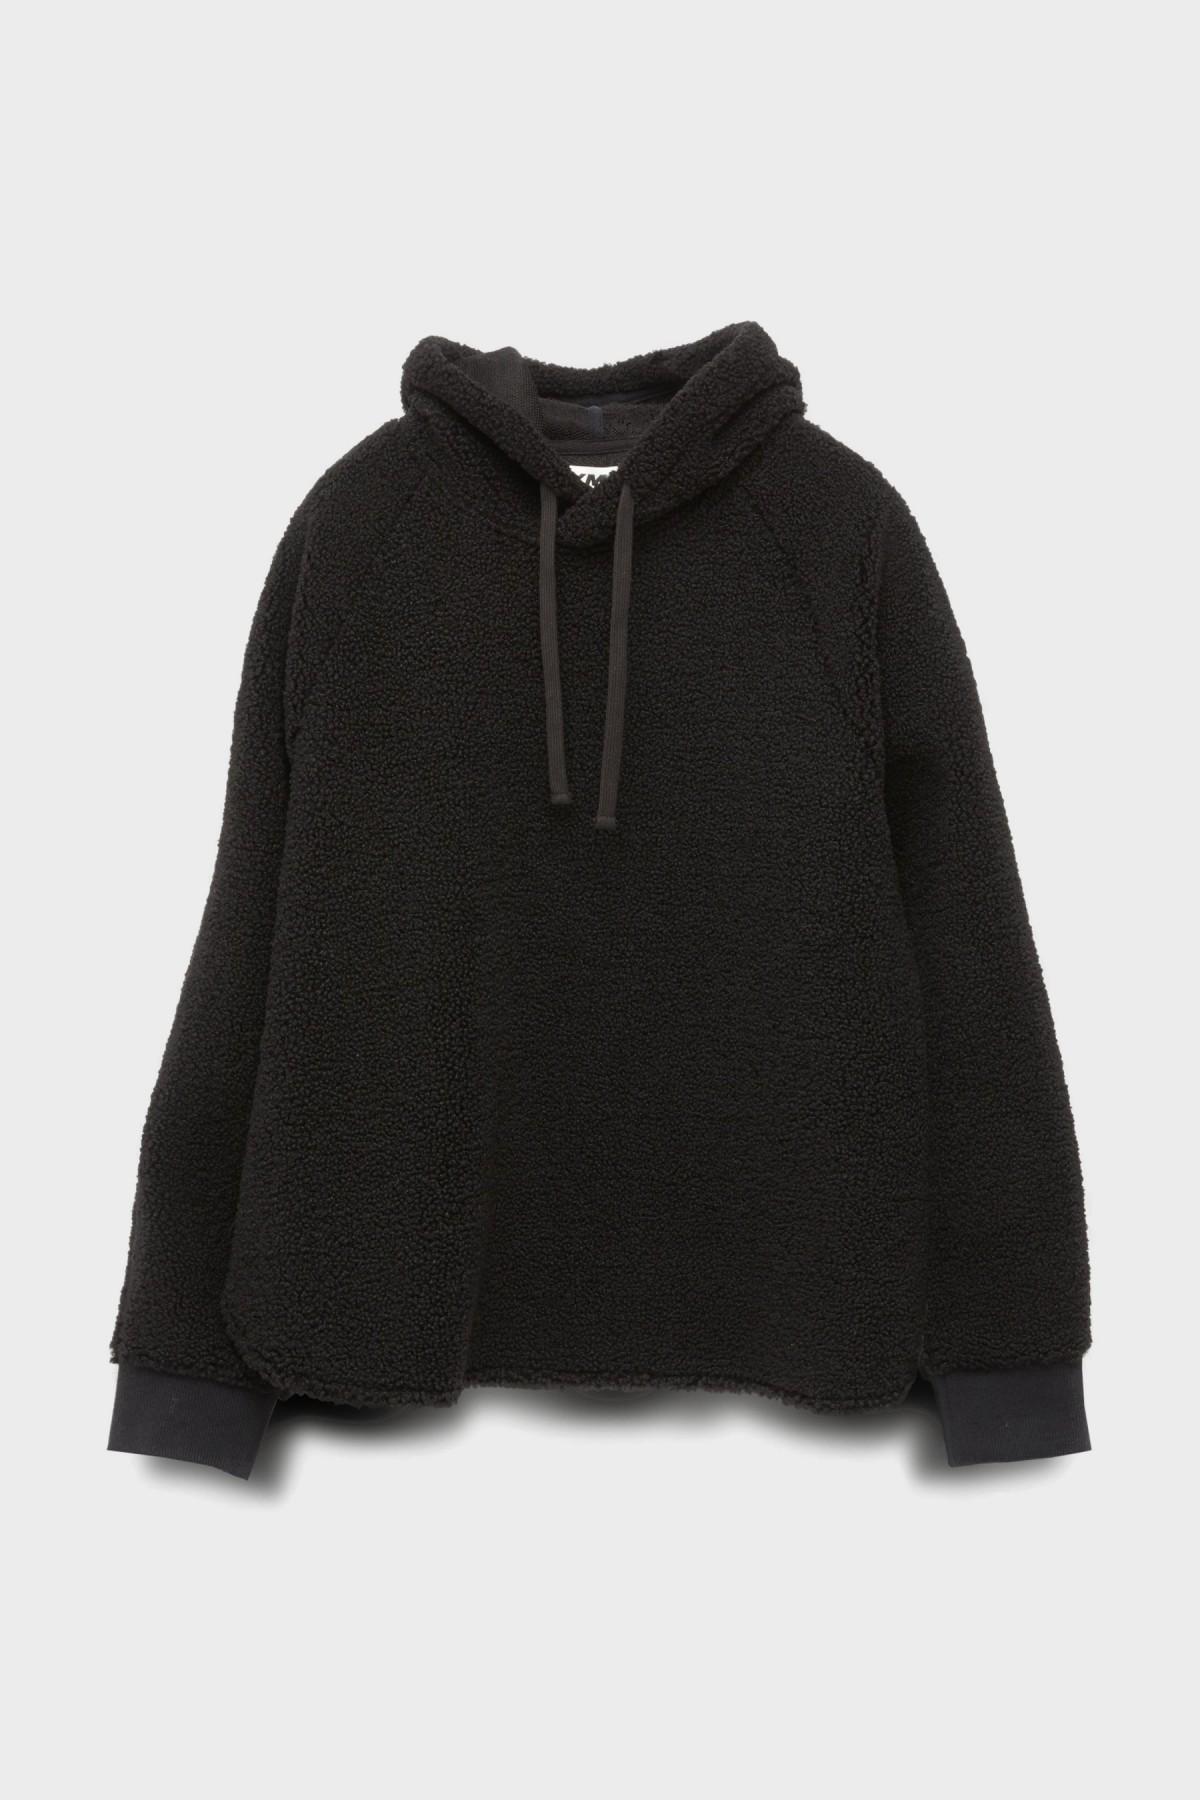 YMC You Must Create Big Hoody Fleece in Black